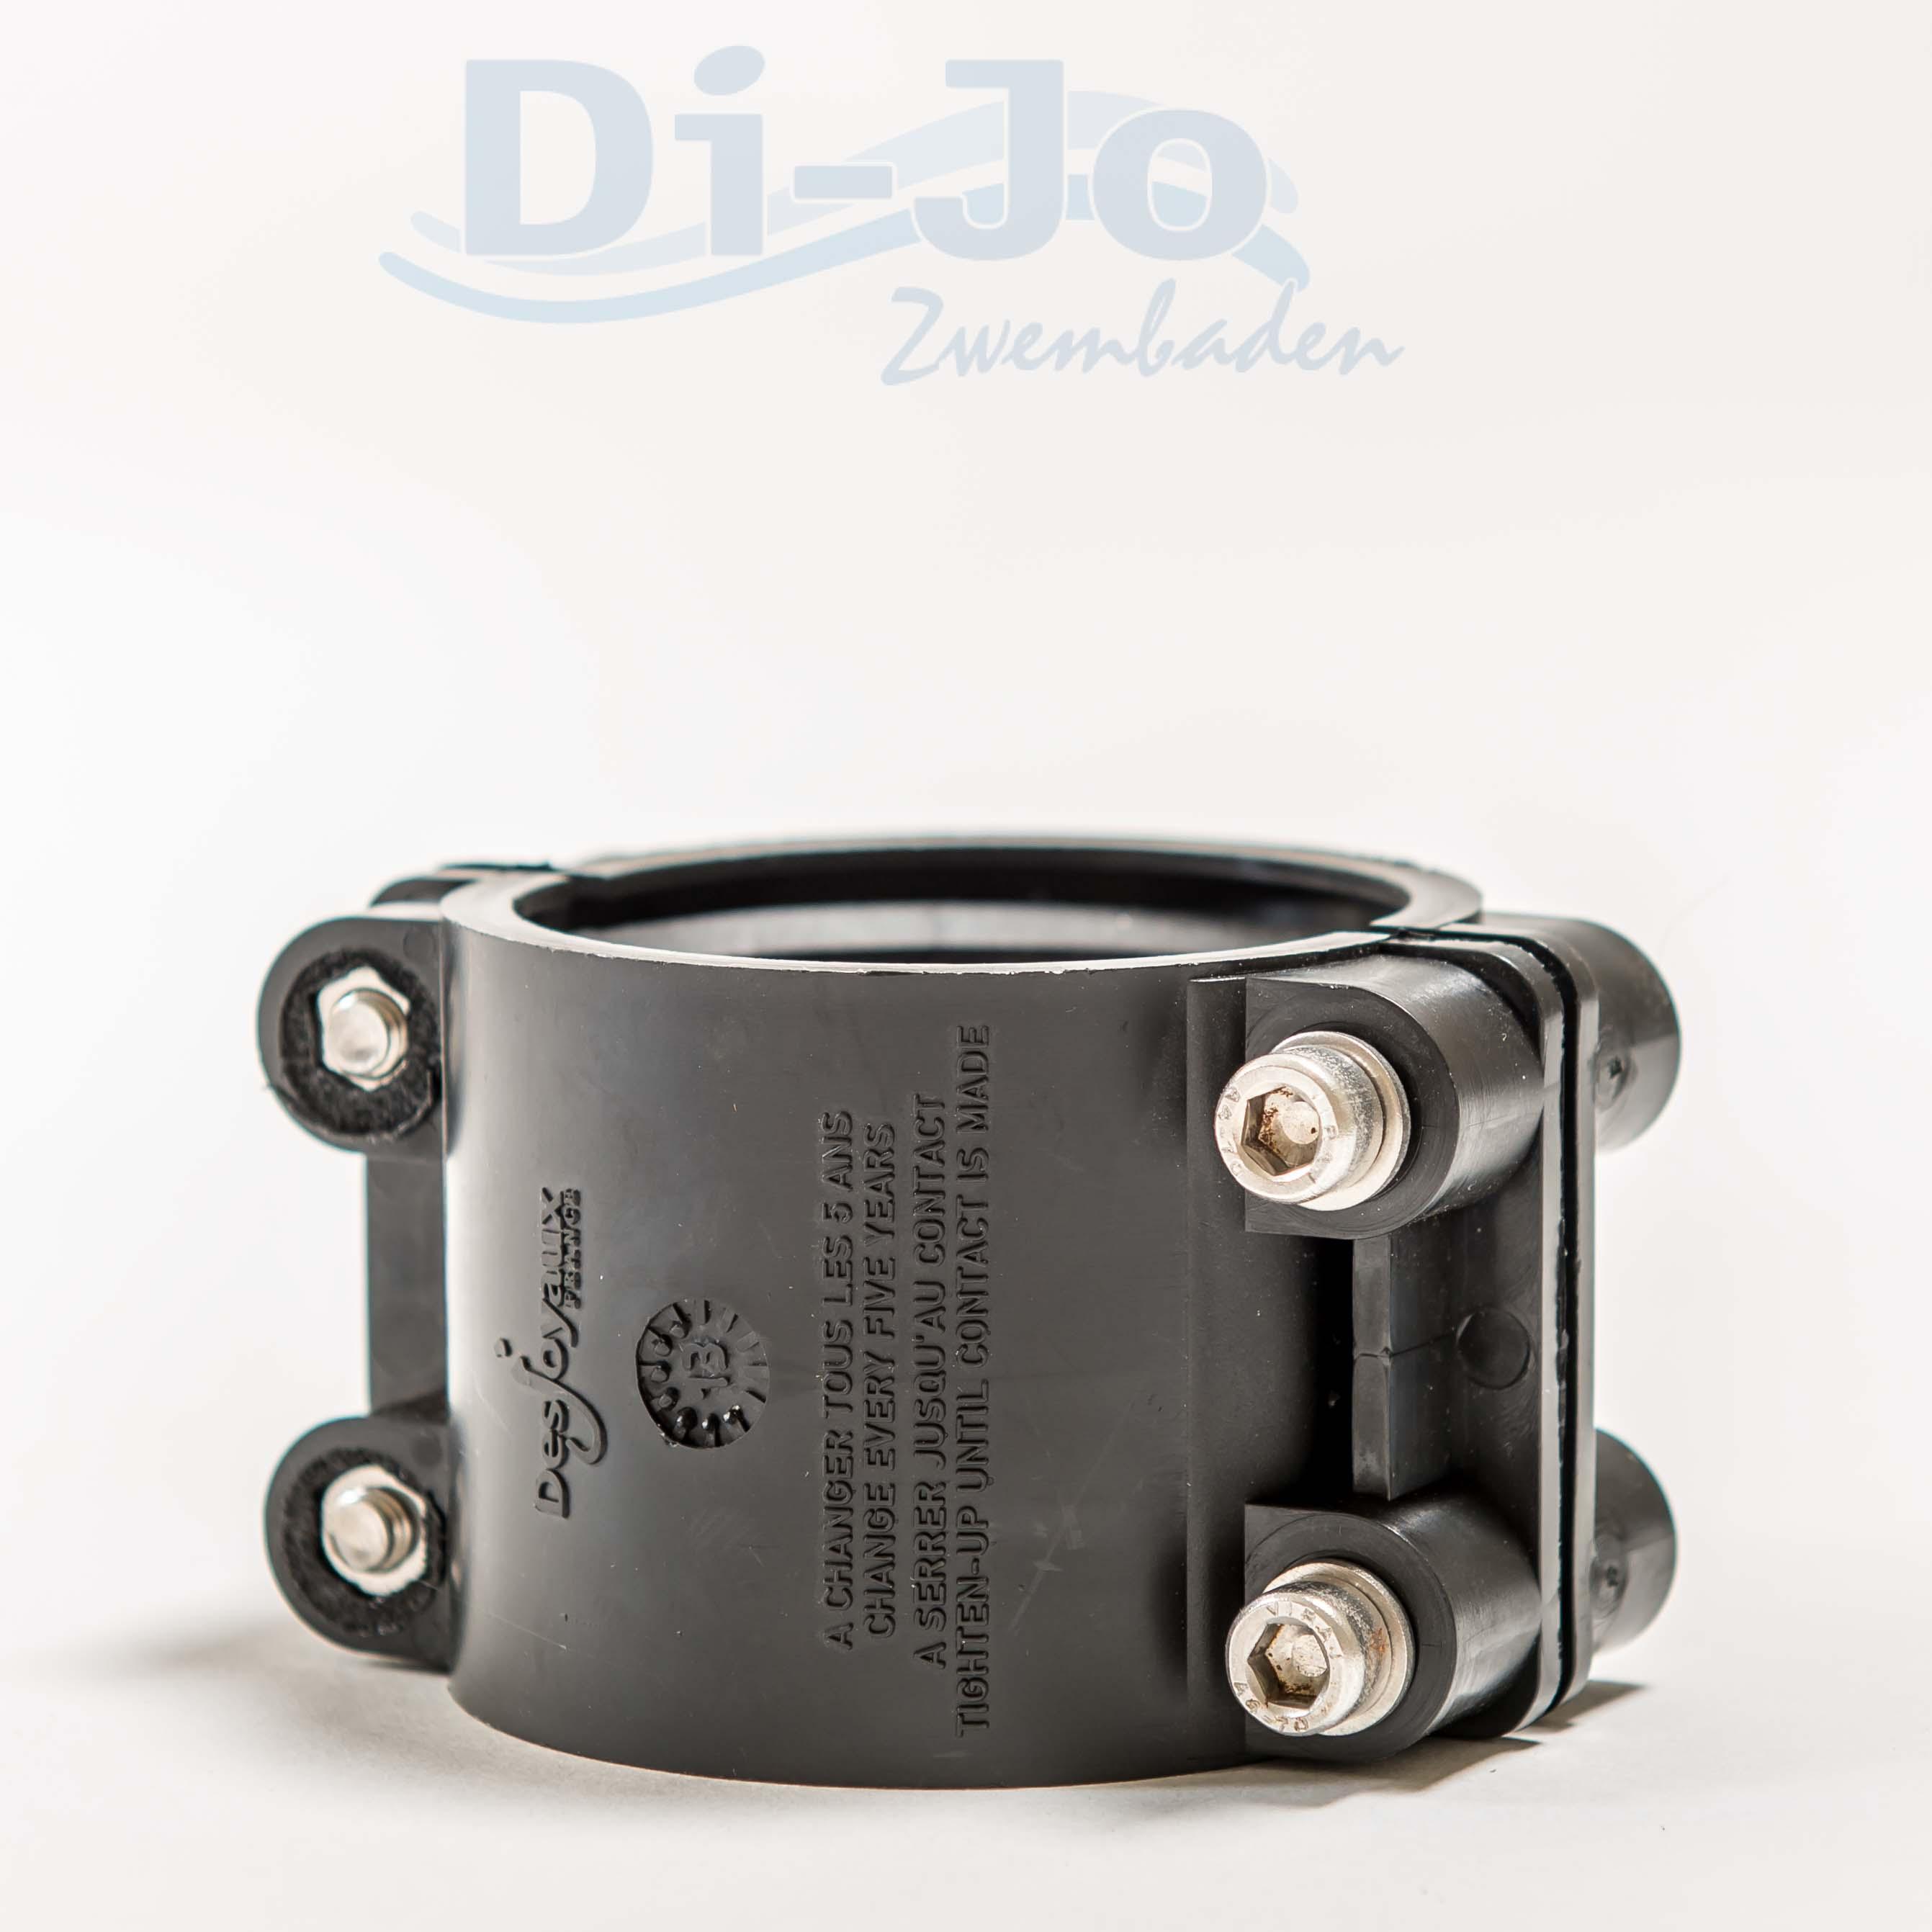 desjoyaux filterpaneel afdichtring 50